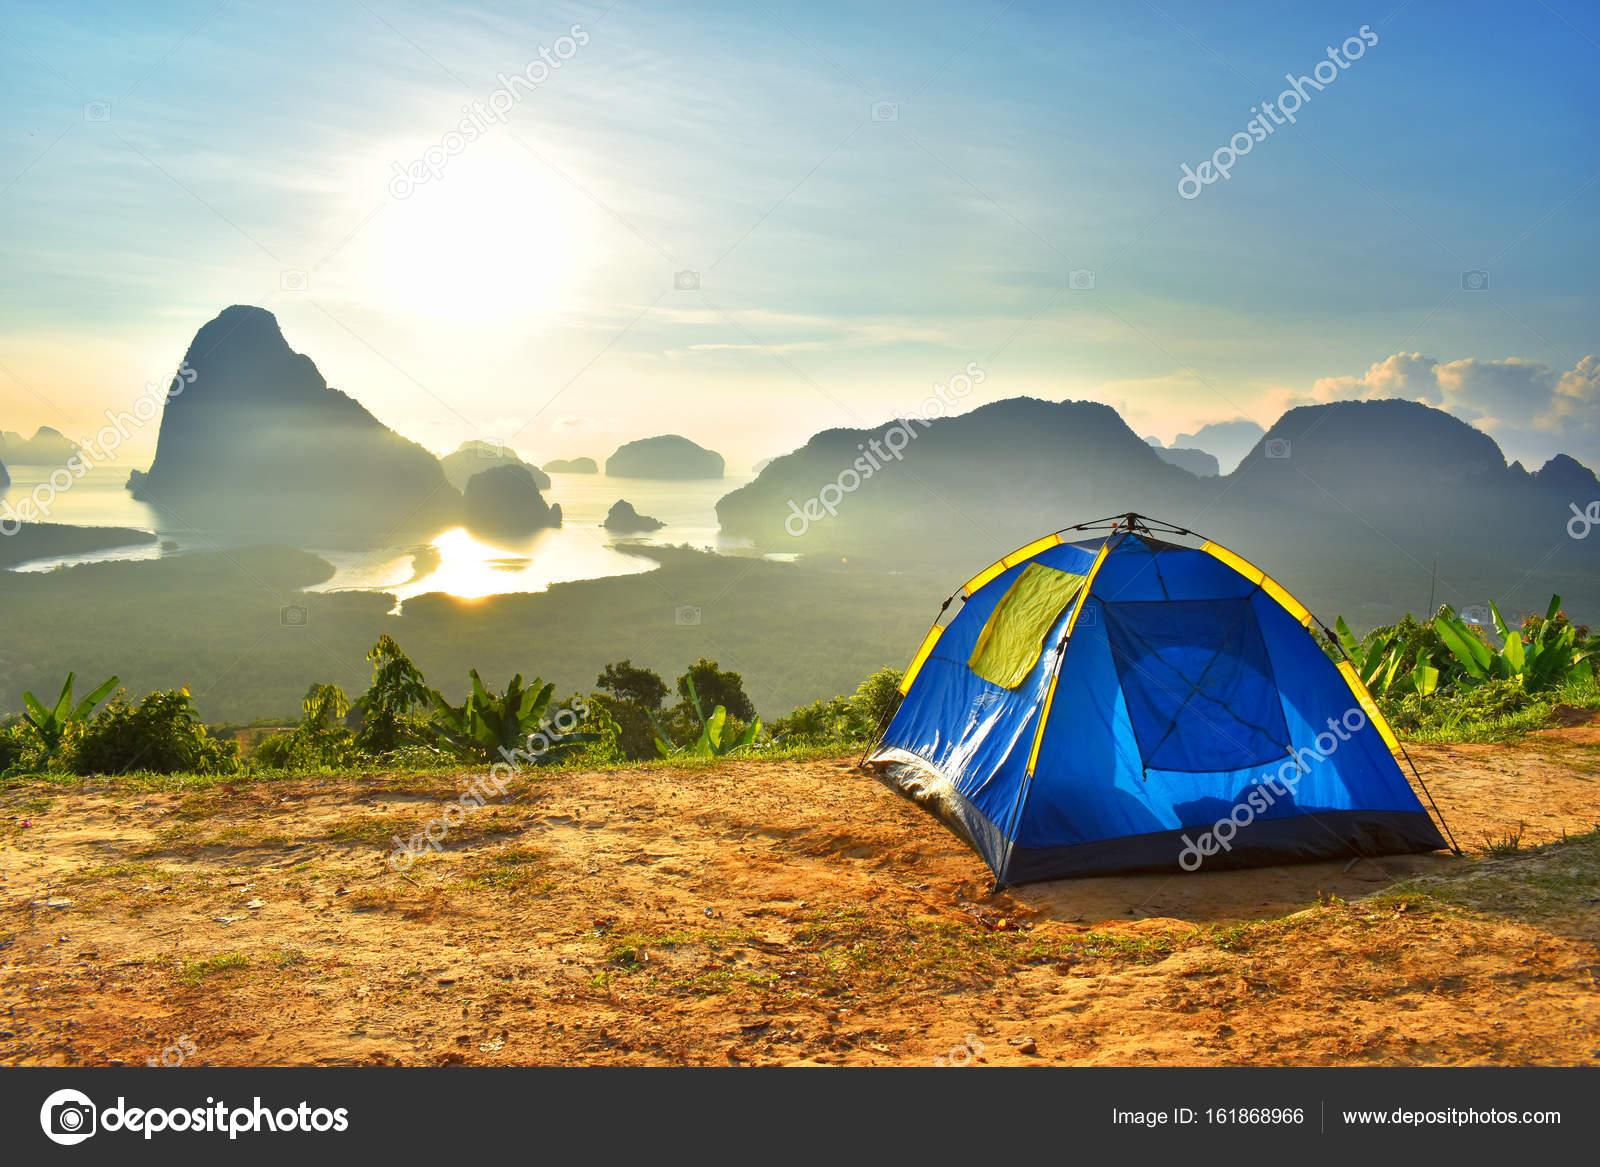 C& Tent Stay Doi Mountain Sky Morning Sunrise Thailand u2014 Photo by Ienjoyeverytime & Camp Tent Stay Doi Mountain Sky Morning Sunrise Thailand u2014 Stock ...